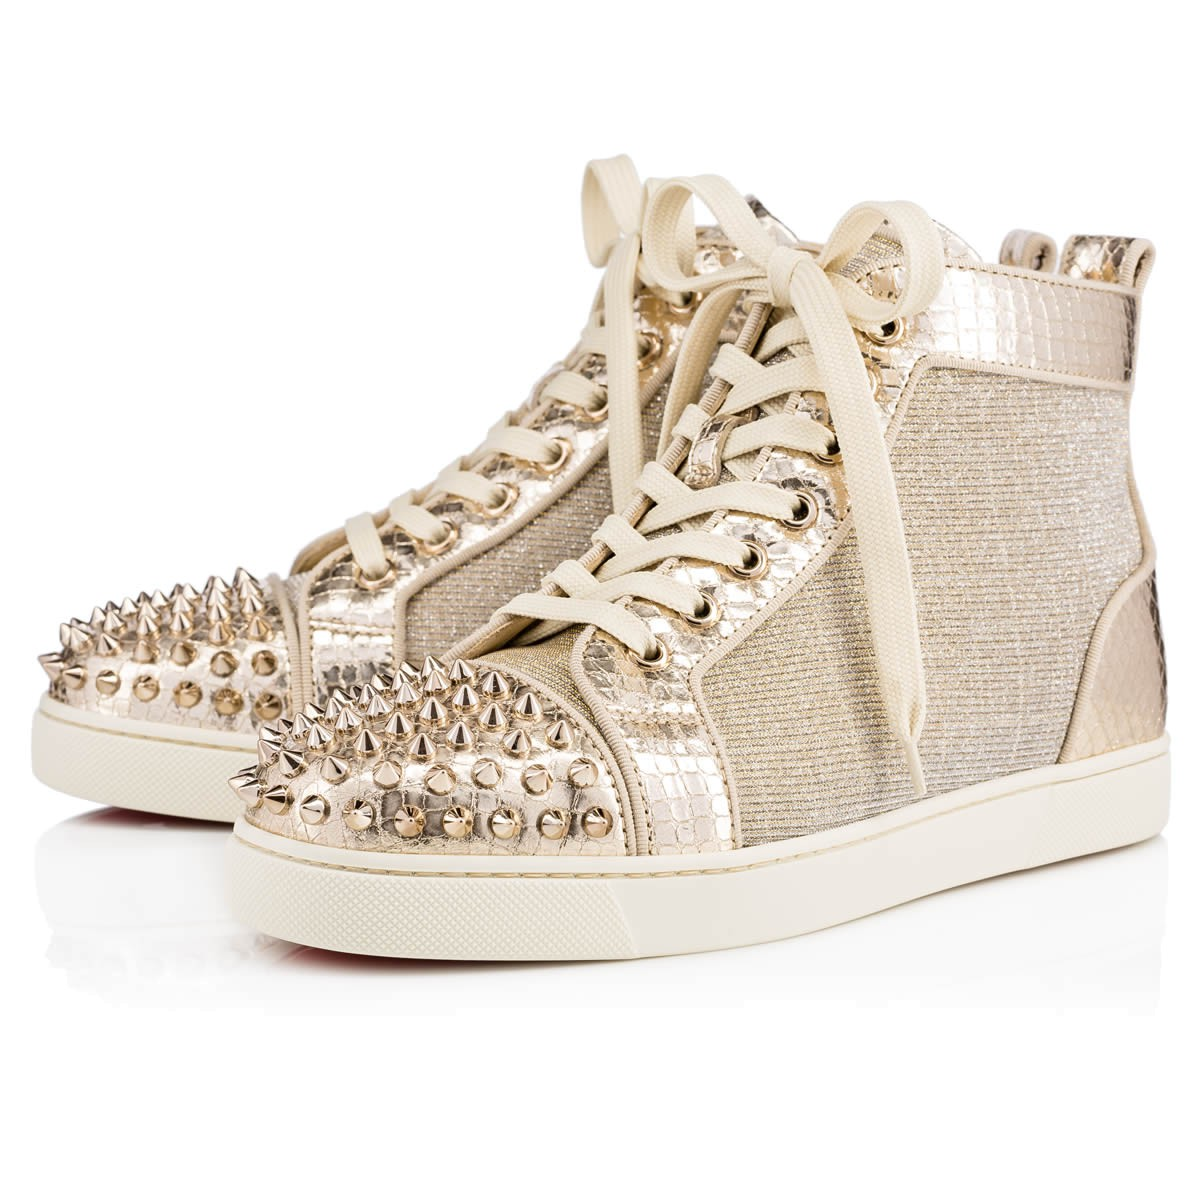 ec77a8ac235b Christian Louboutin Lou Spikes Metallic High-Top Sneakers In Version Gold